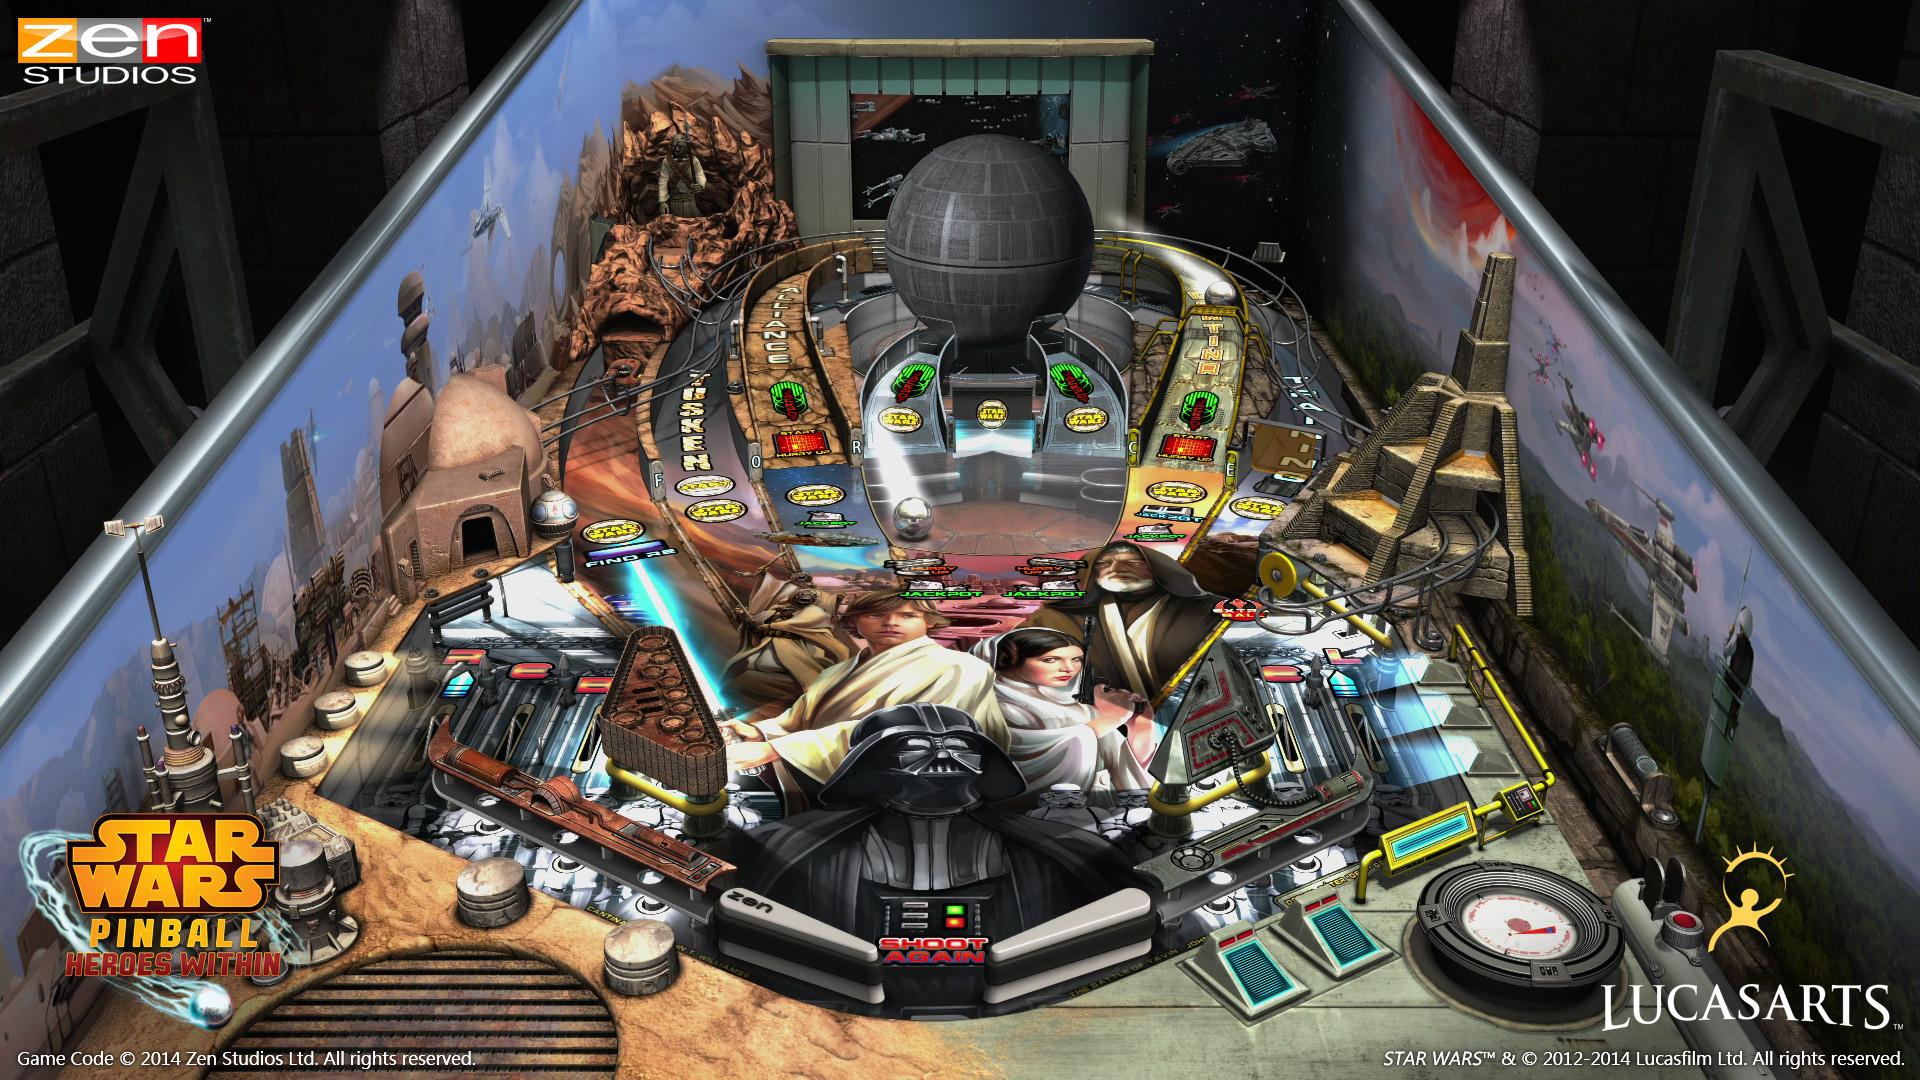 Star Wars Pinball - The Clone Wars Trailer - GameSpot